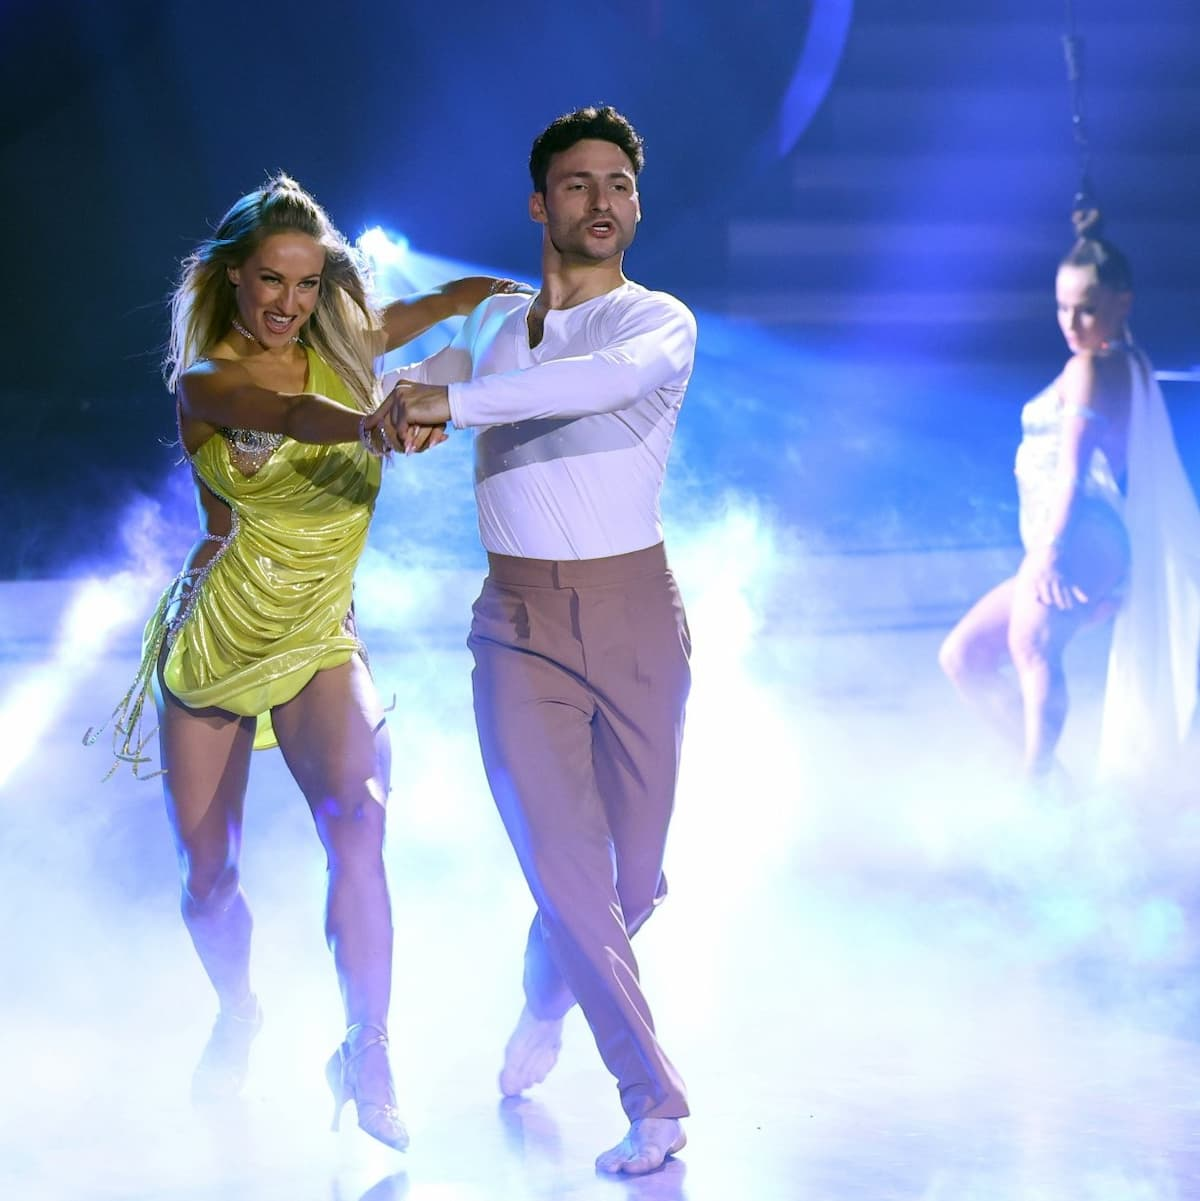 Oxana Lebedew, Robert Beitsch und Kashka Katharina Lebedew Profi-Challenge Let's dance am 4.6.2021